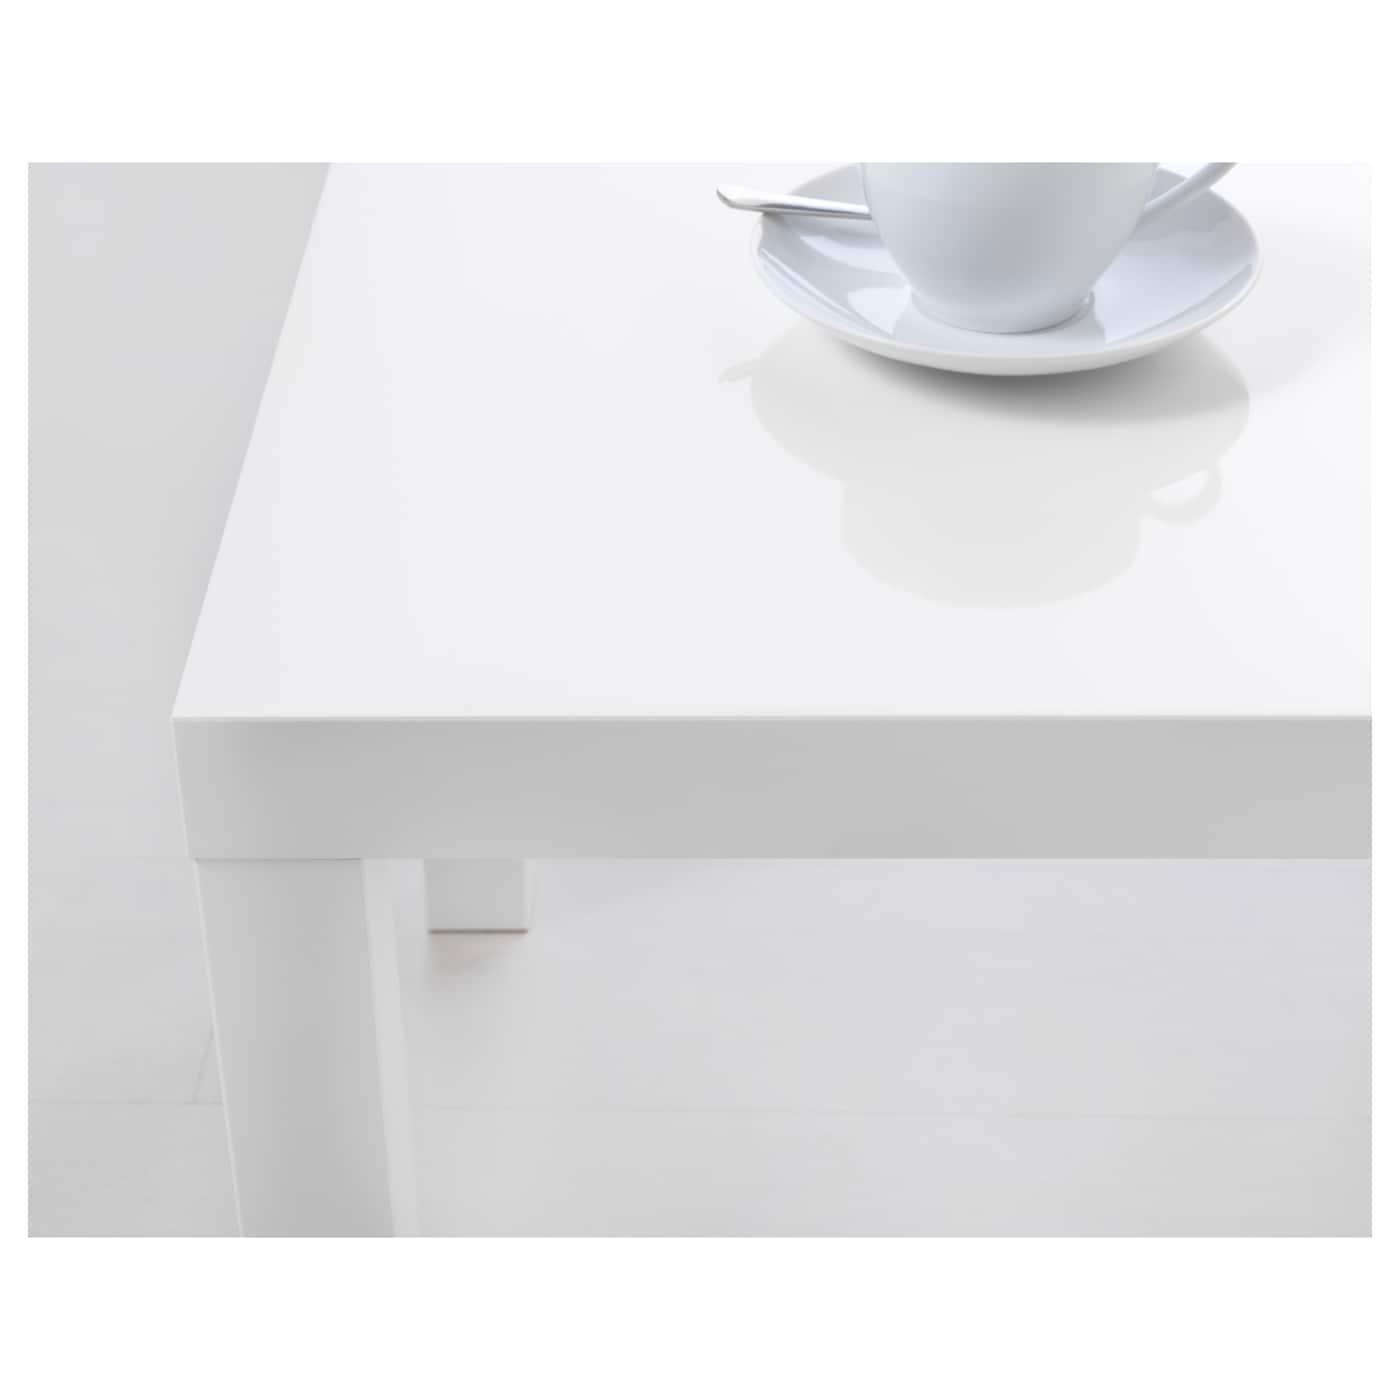 lack table d 39 appoint brillant blanc 55 x 55 cm ikea. Black Bedroom Furniture Sets. Home Design Ideas